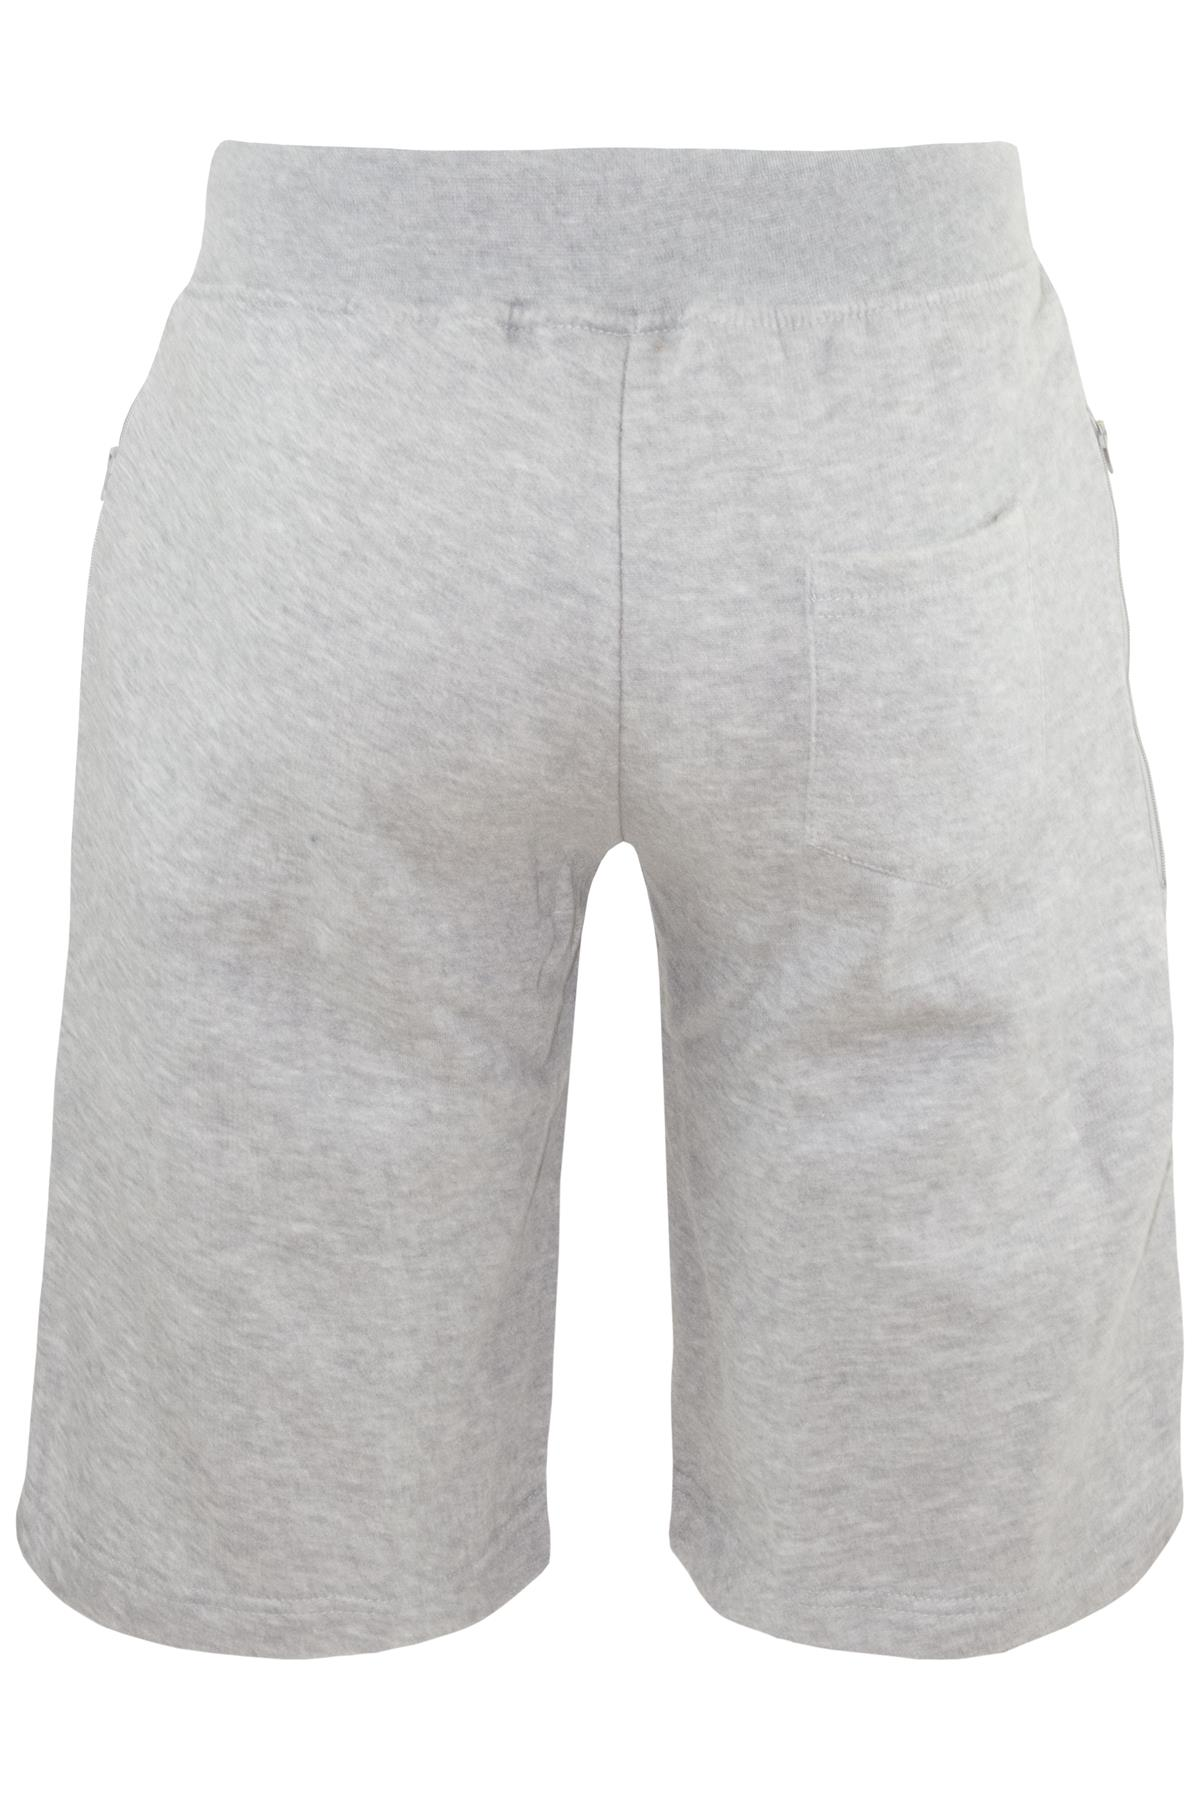 Da Uomo Pantaloni Sportivi Plain Estate Tasche in Pile Palestra Elastico Jogging Jogging Pantaloncini